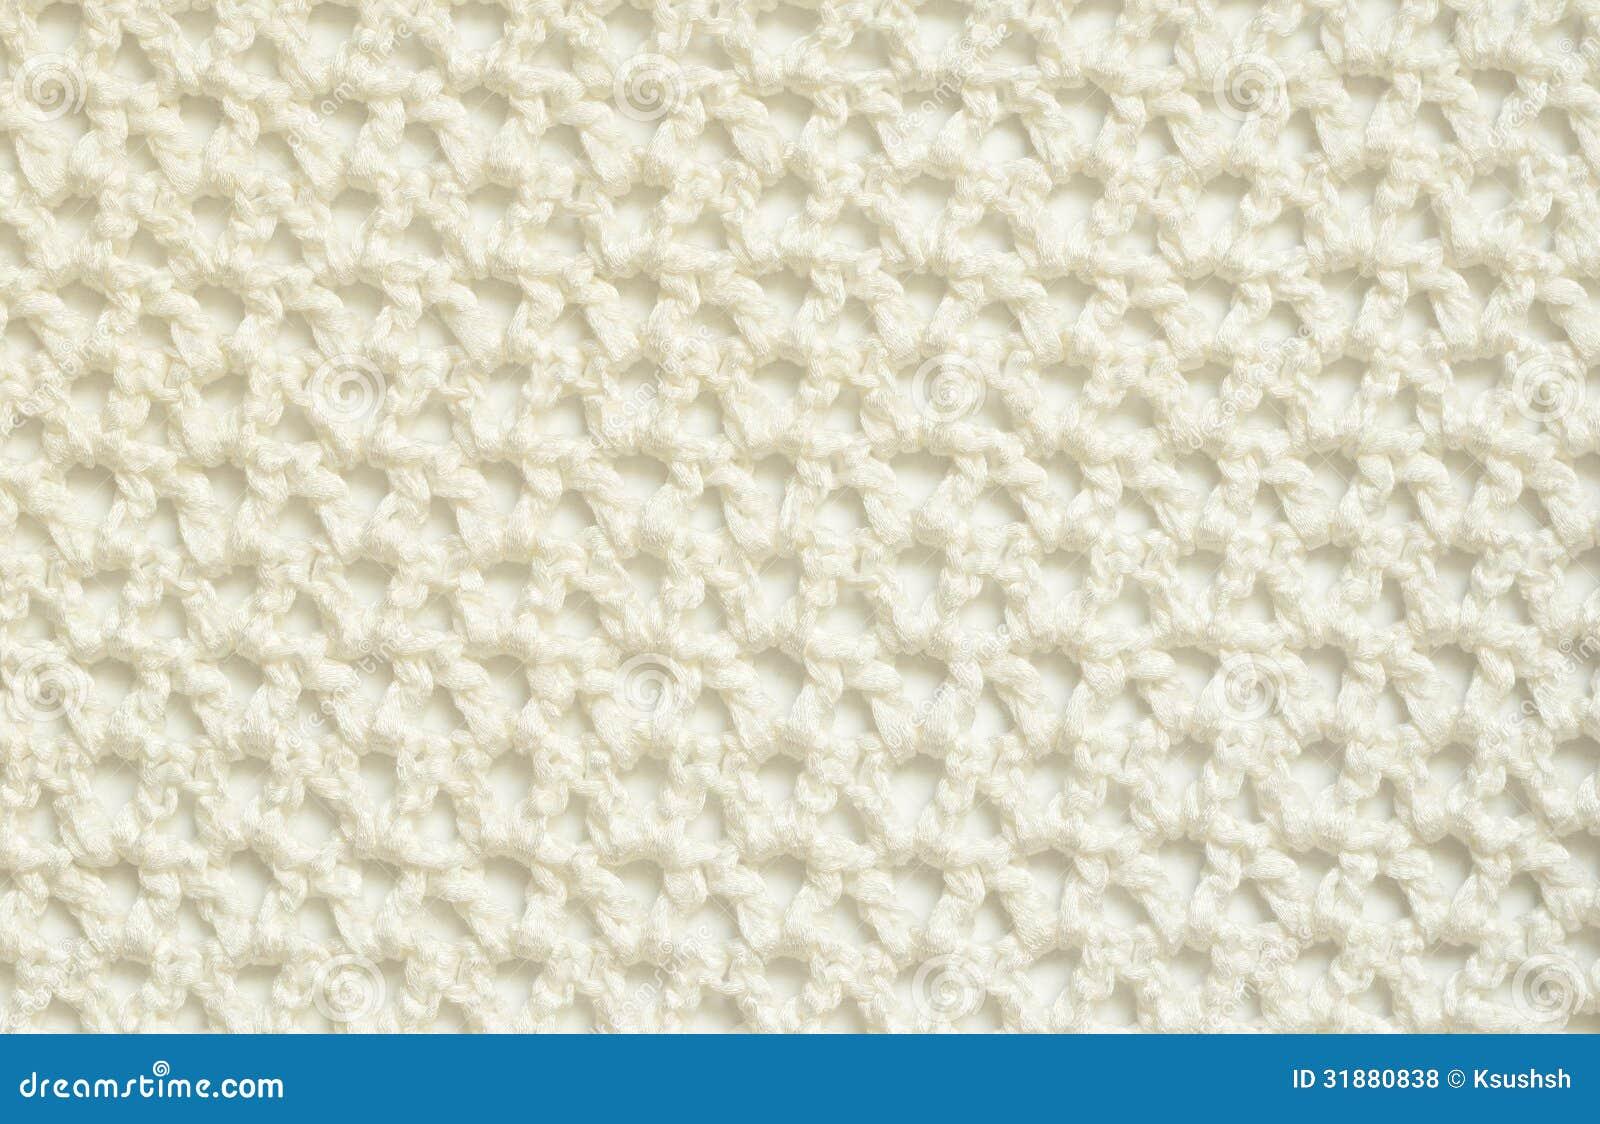 Crochet Materials : White crochet fabric for background.